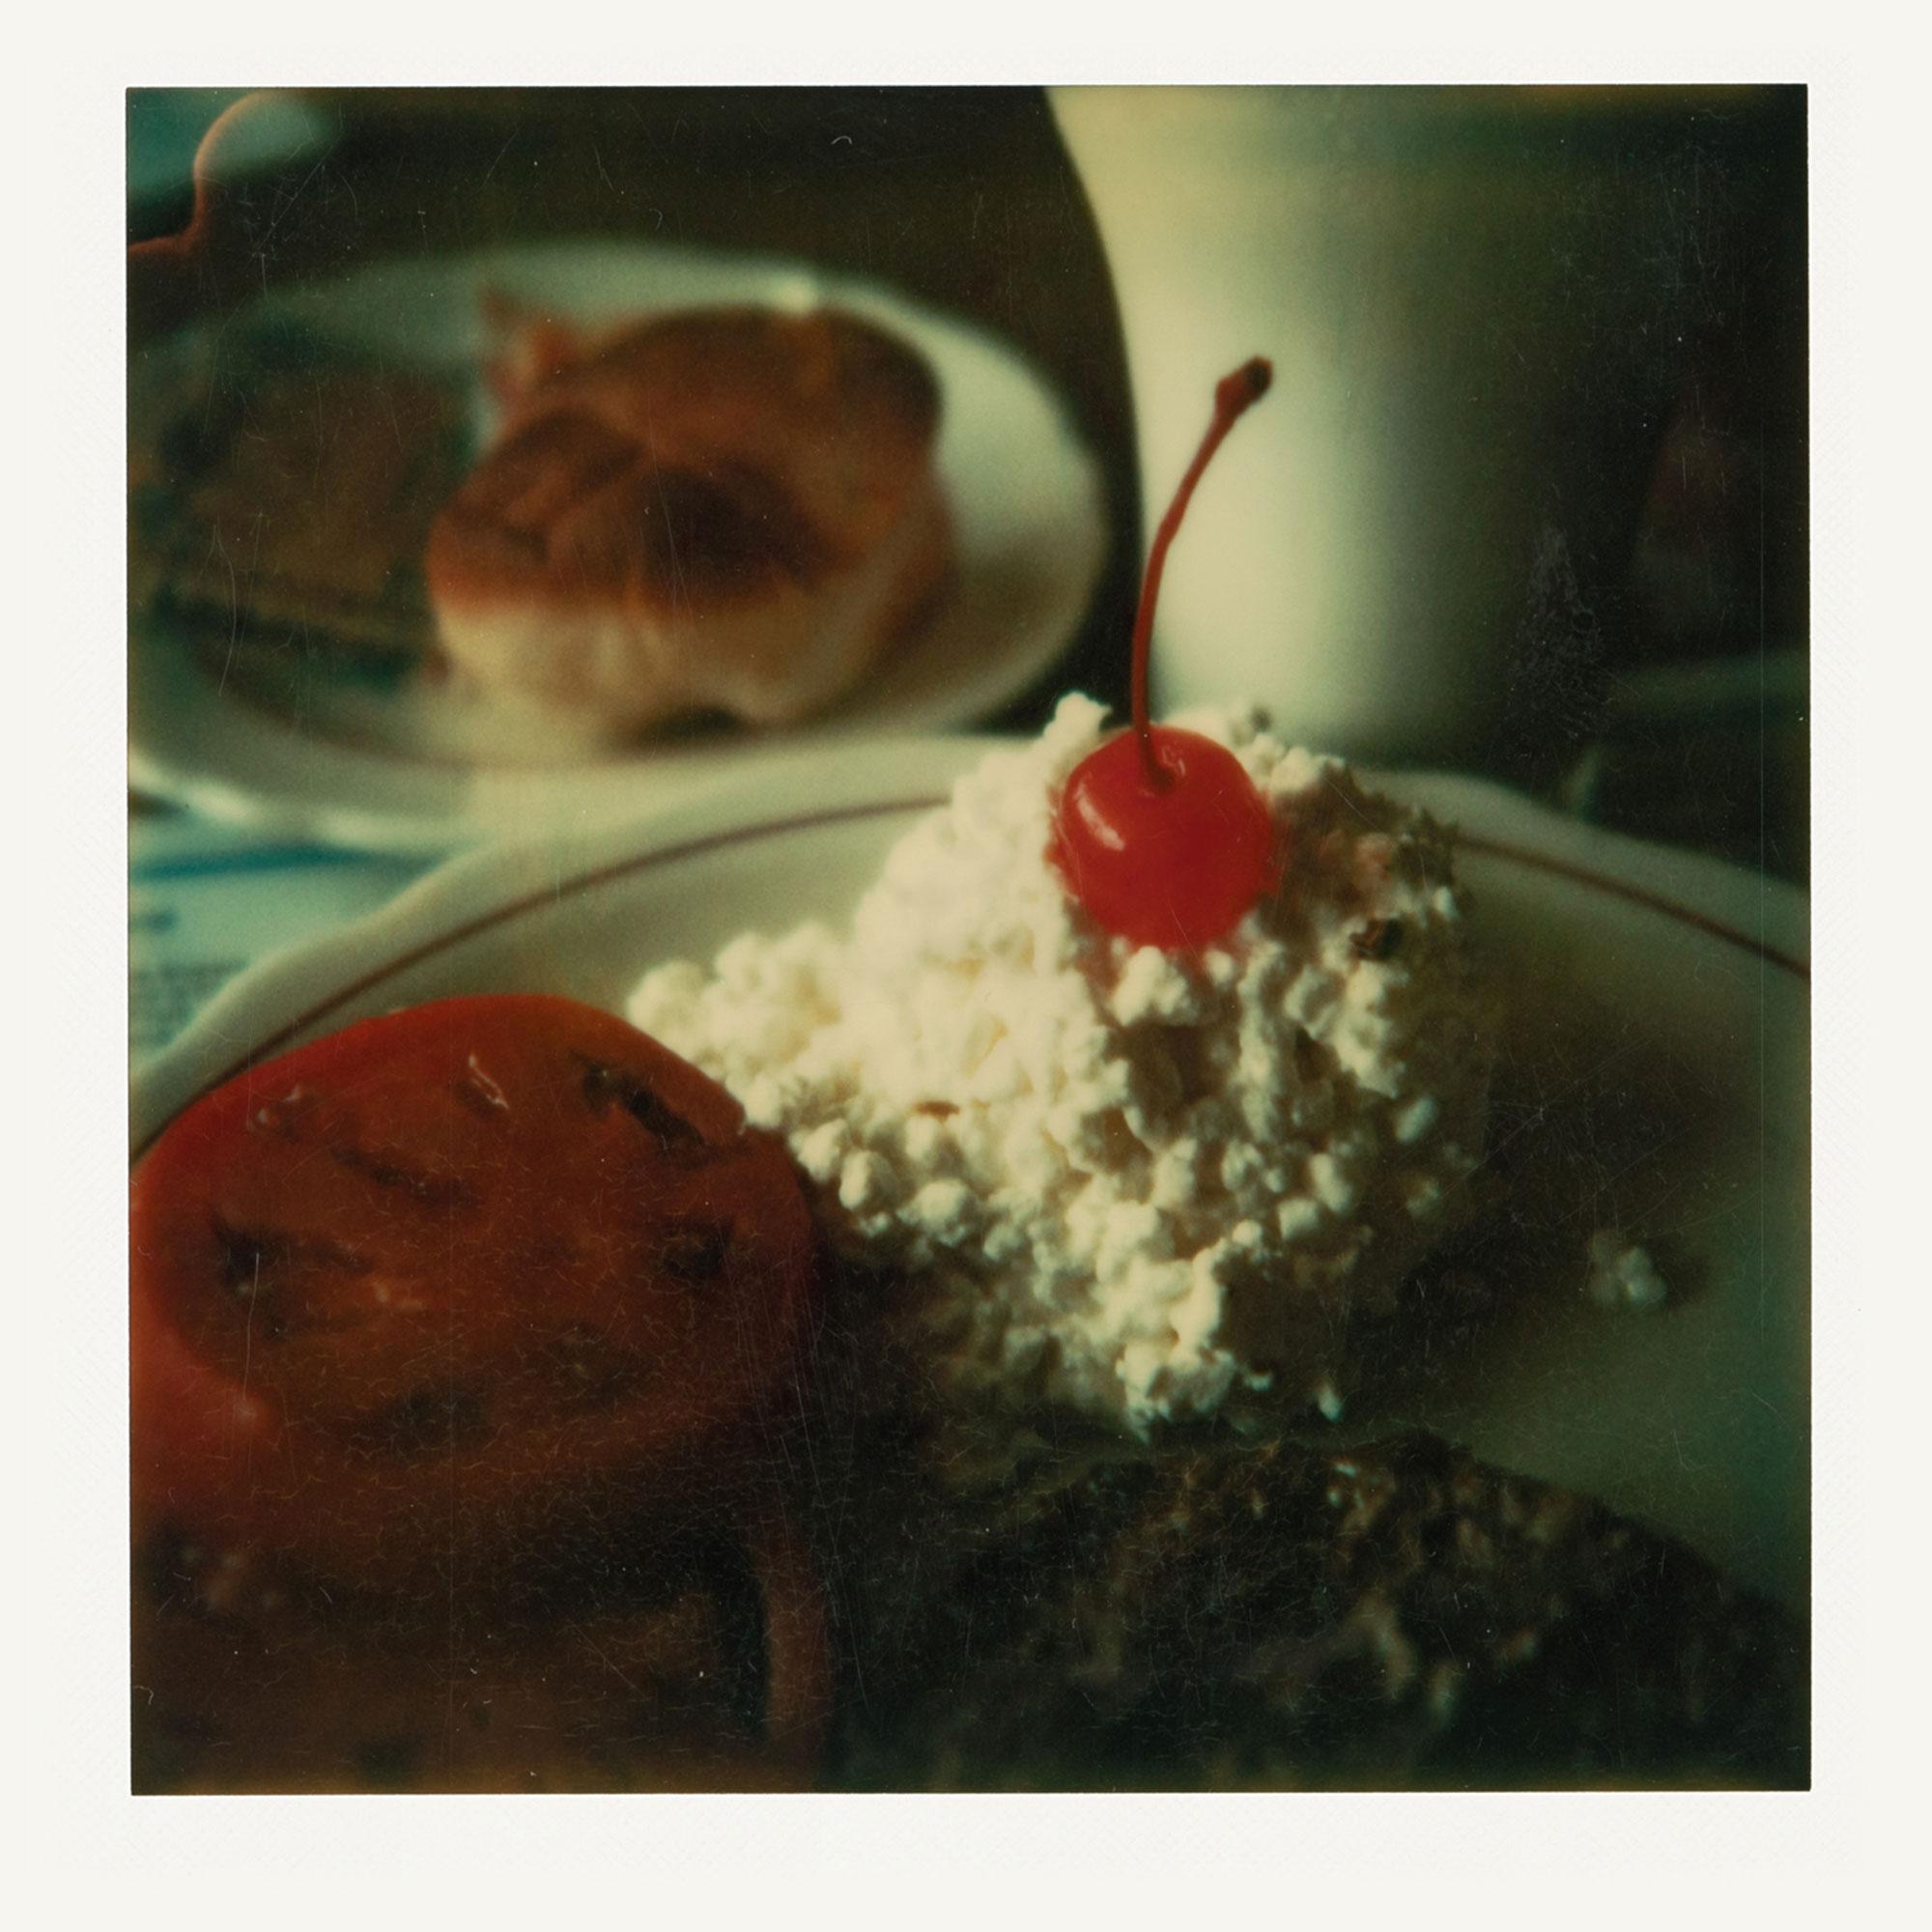 Завтрак вНью-Йорке, 1973 год